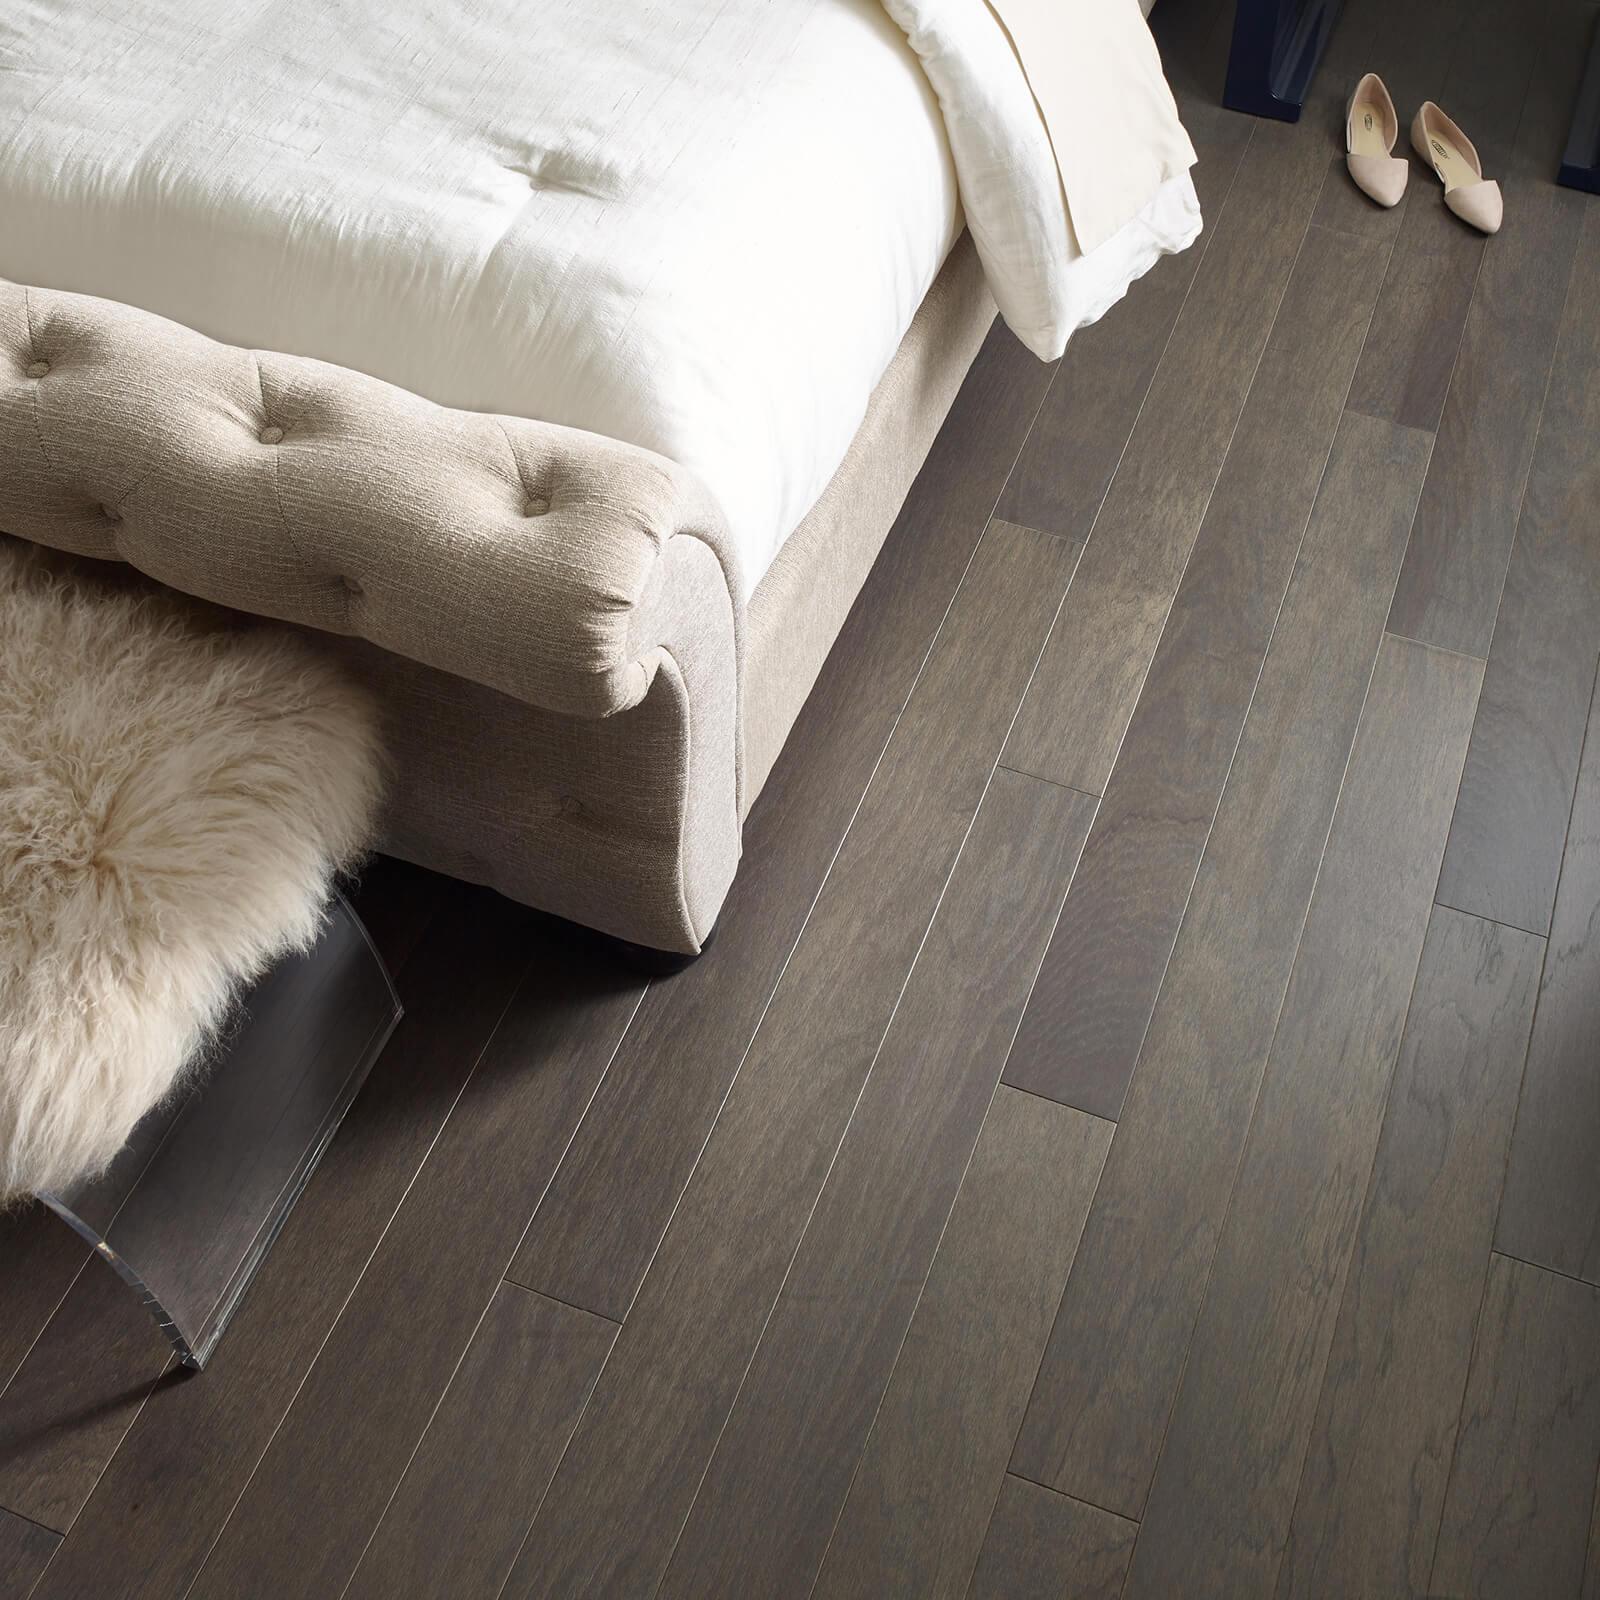 Northington smooth flooring | Flooring by Wilson's Carpet Plus